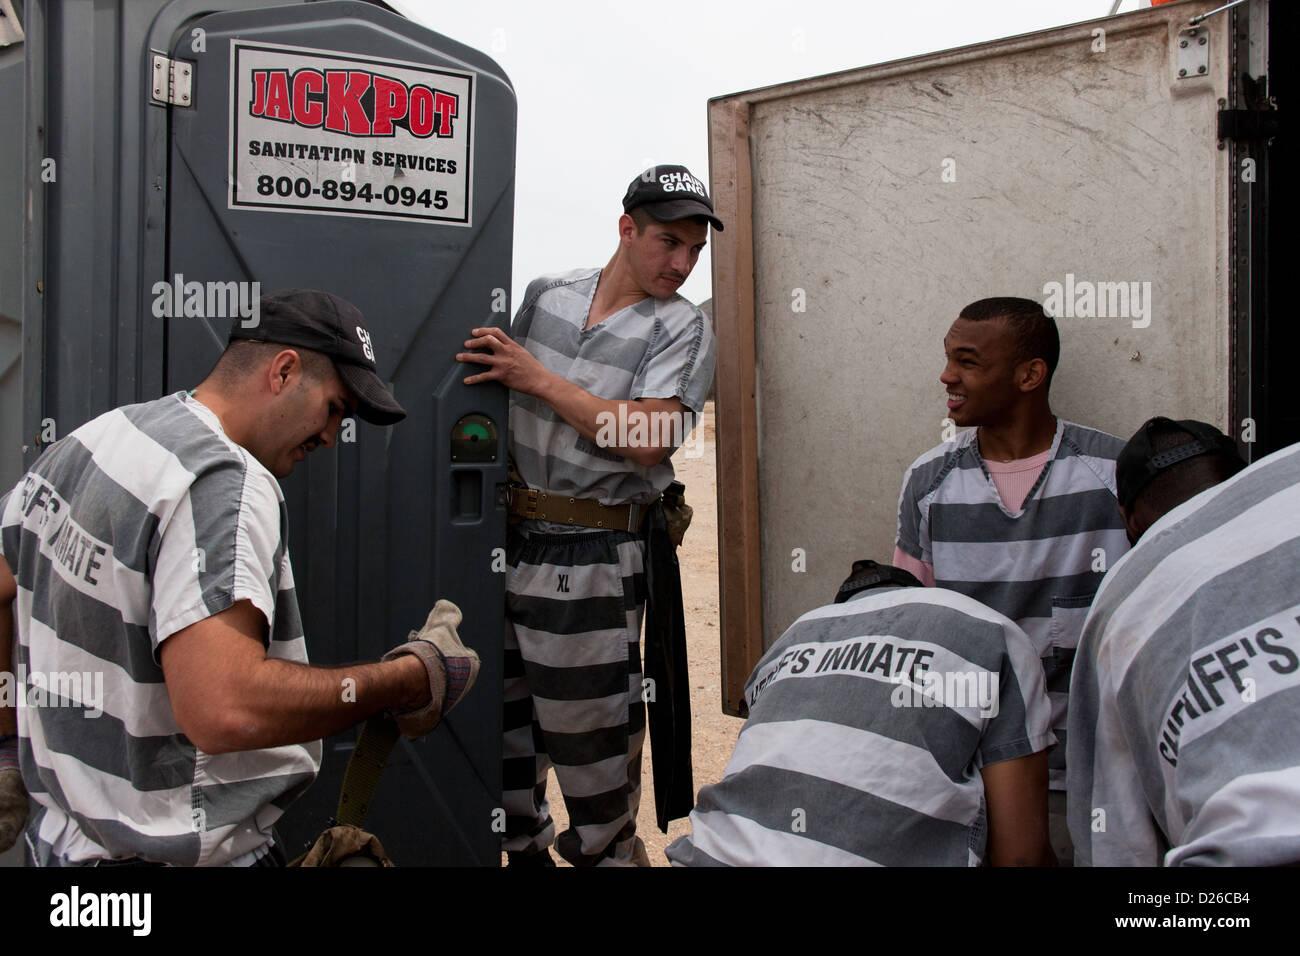 The chain gang at Maricopa County Jail in Phoenix Arizona